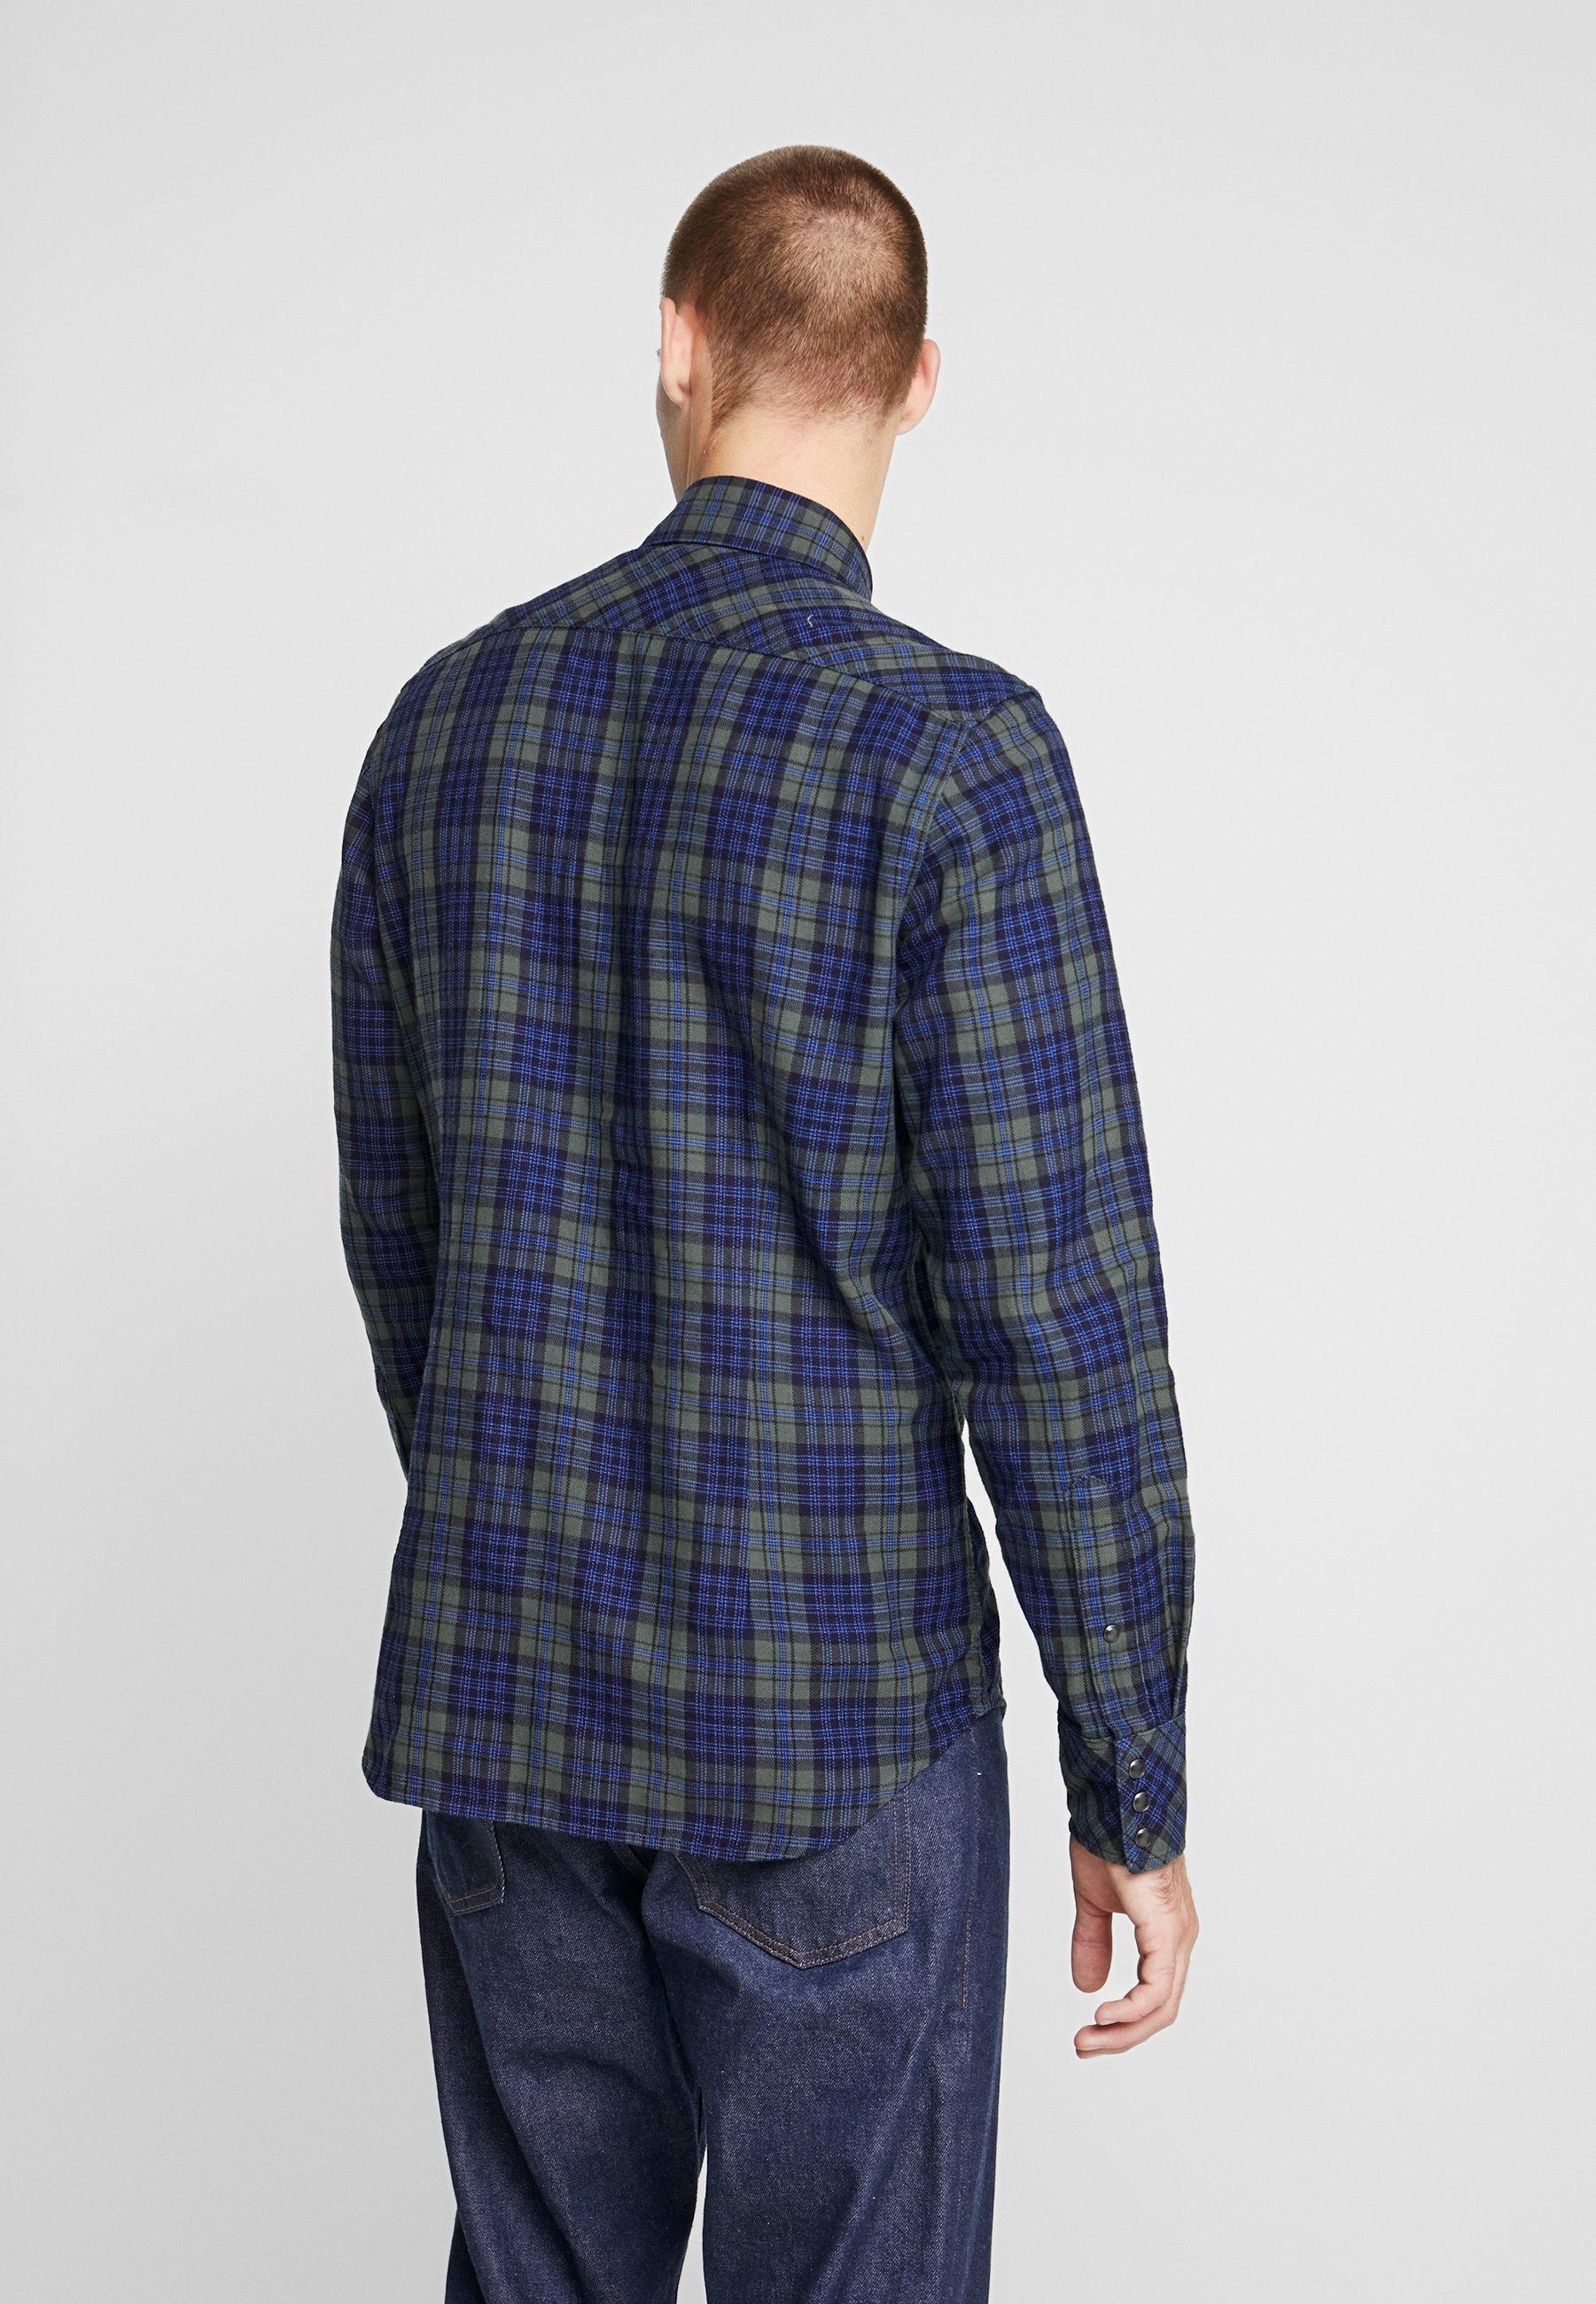 G-star Slim Shirt - Chemise Indigo/dark Vermont Green